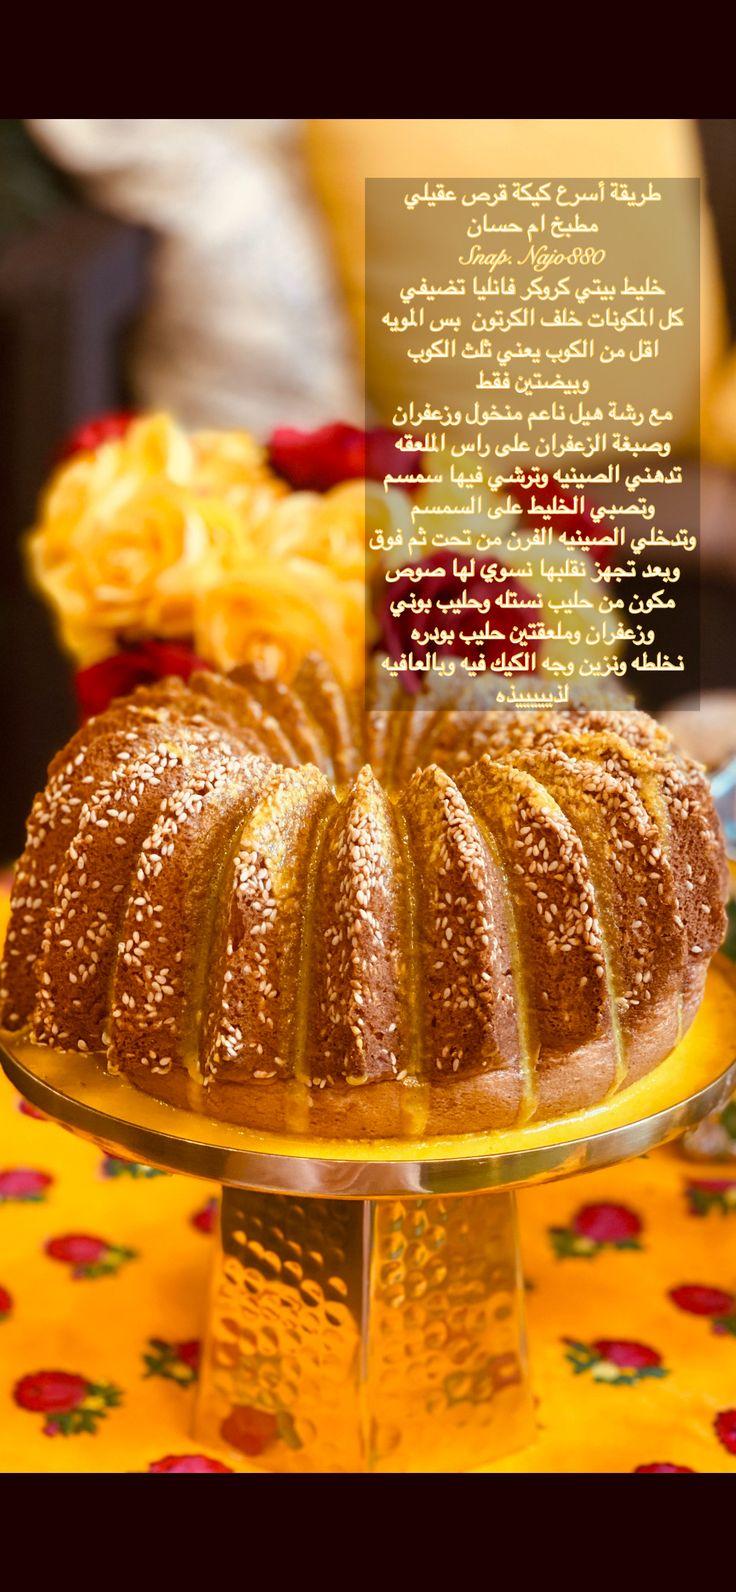 Pin By Najlatala On عدسة سنابي Najo880 In 2021 Food Receipes Food Cooking Cake